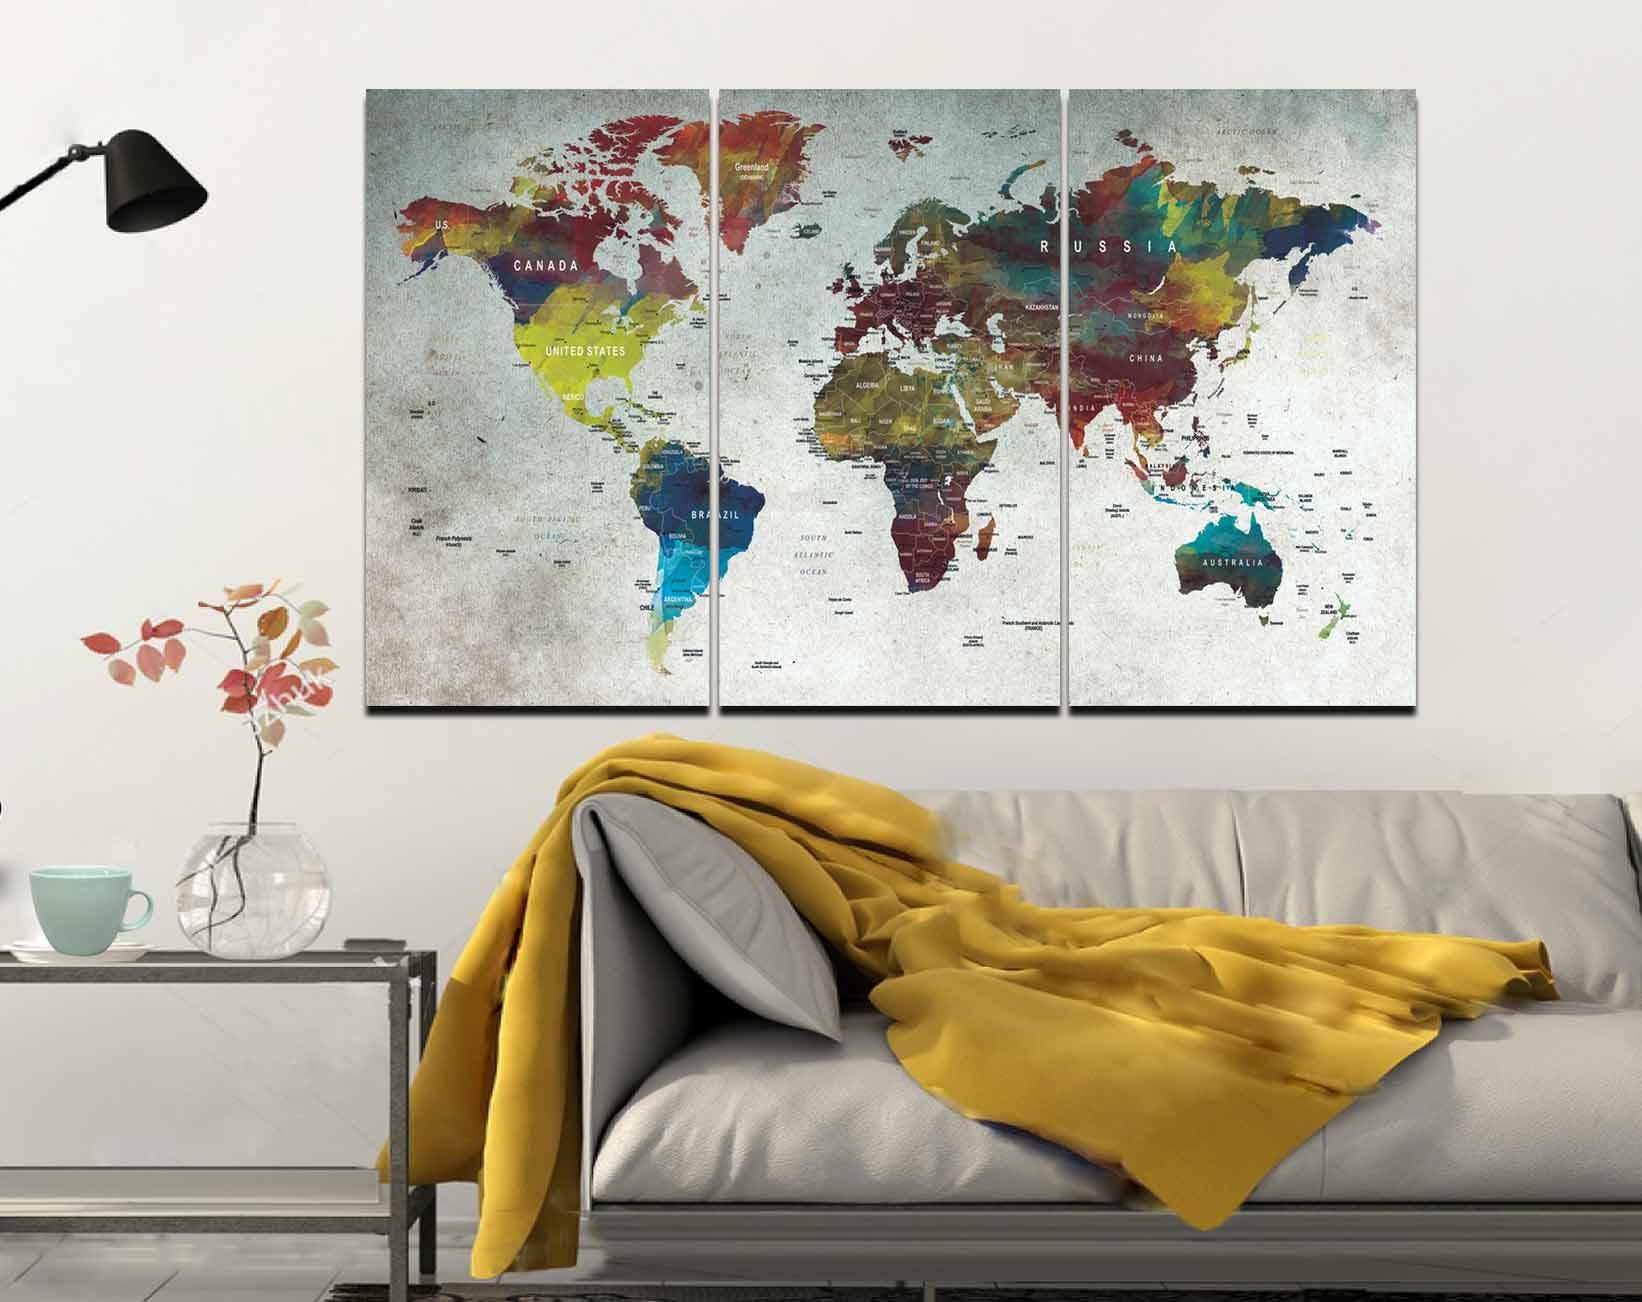 World mapmapwall artlarge world mappush pin mapabstract world world mapmapwall artlarge world mappush pin mapabstract world mappush pin map canvasdecorative canvas artworld travel mapmap canvas gumiabroncs Image collections